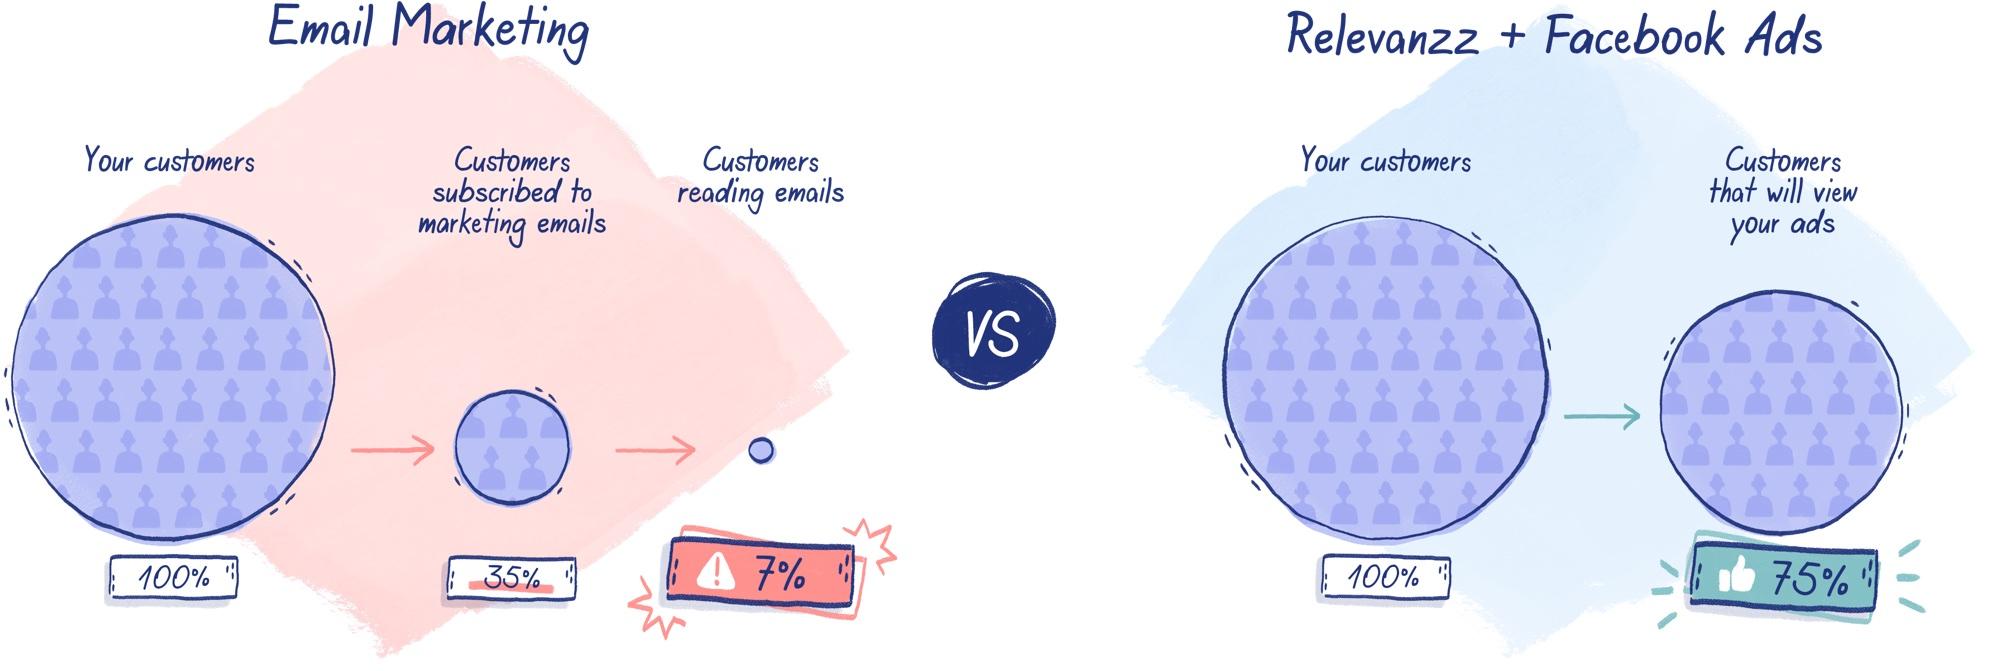 Email marketing vs Relevanzz